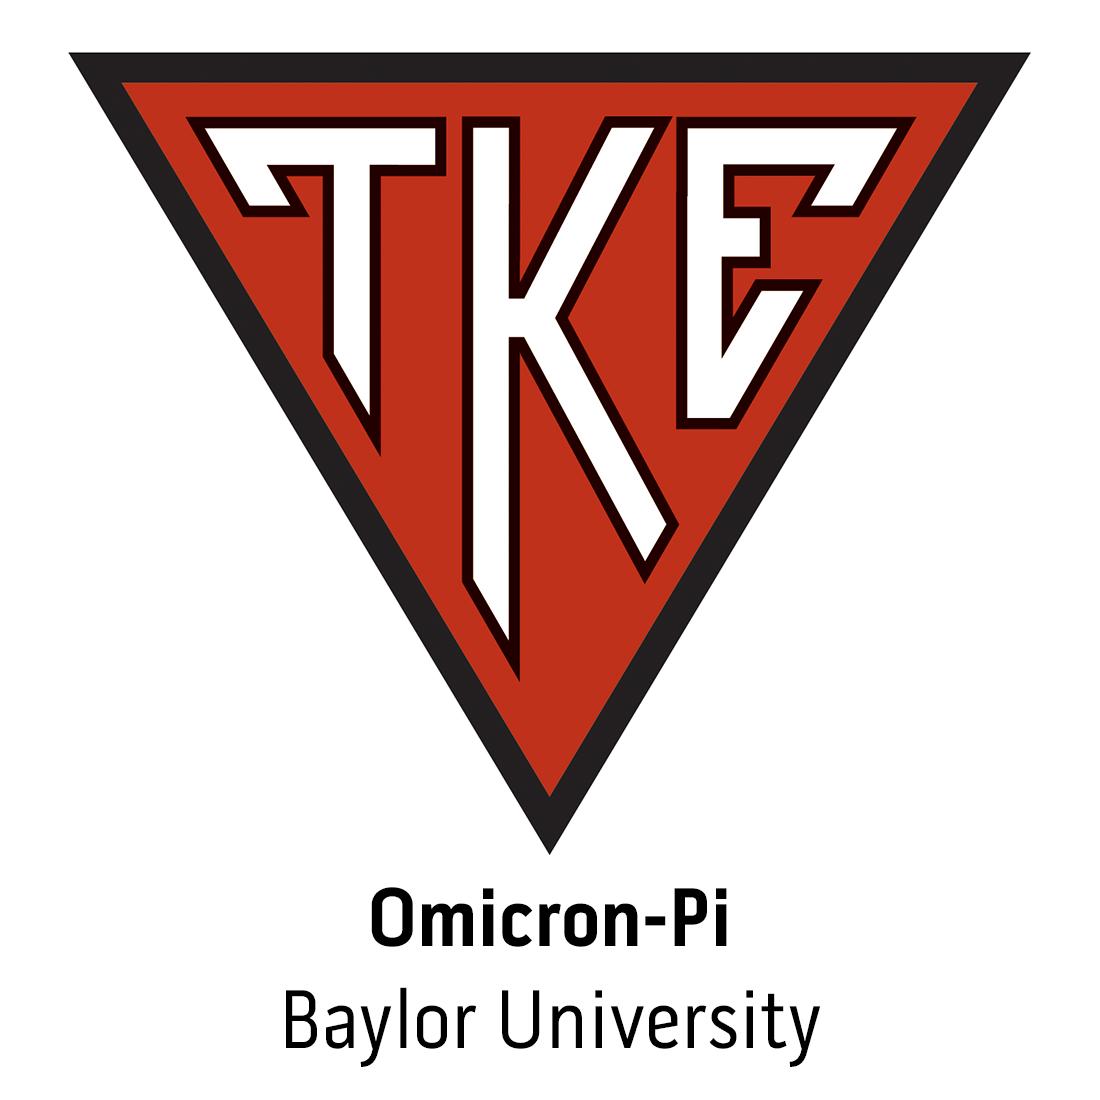 Omicron-Pi Chapter at Baylor University